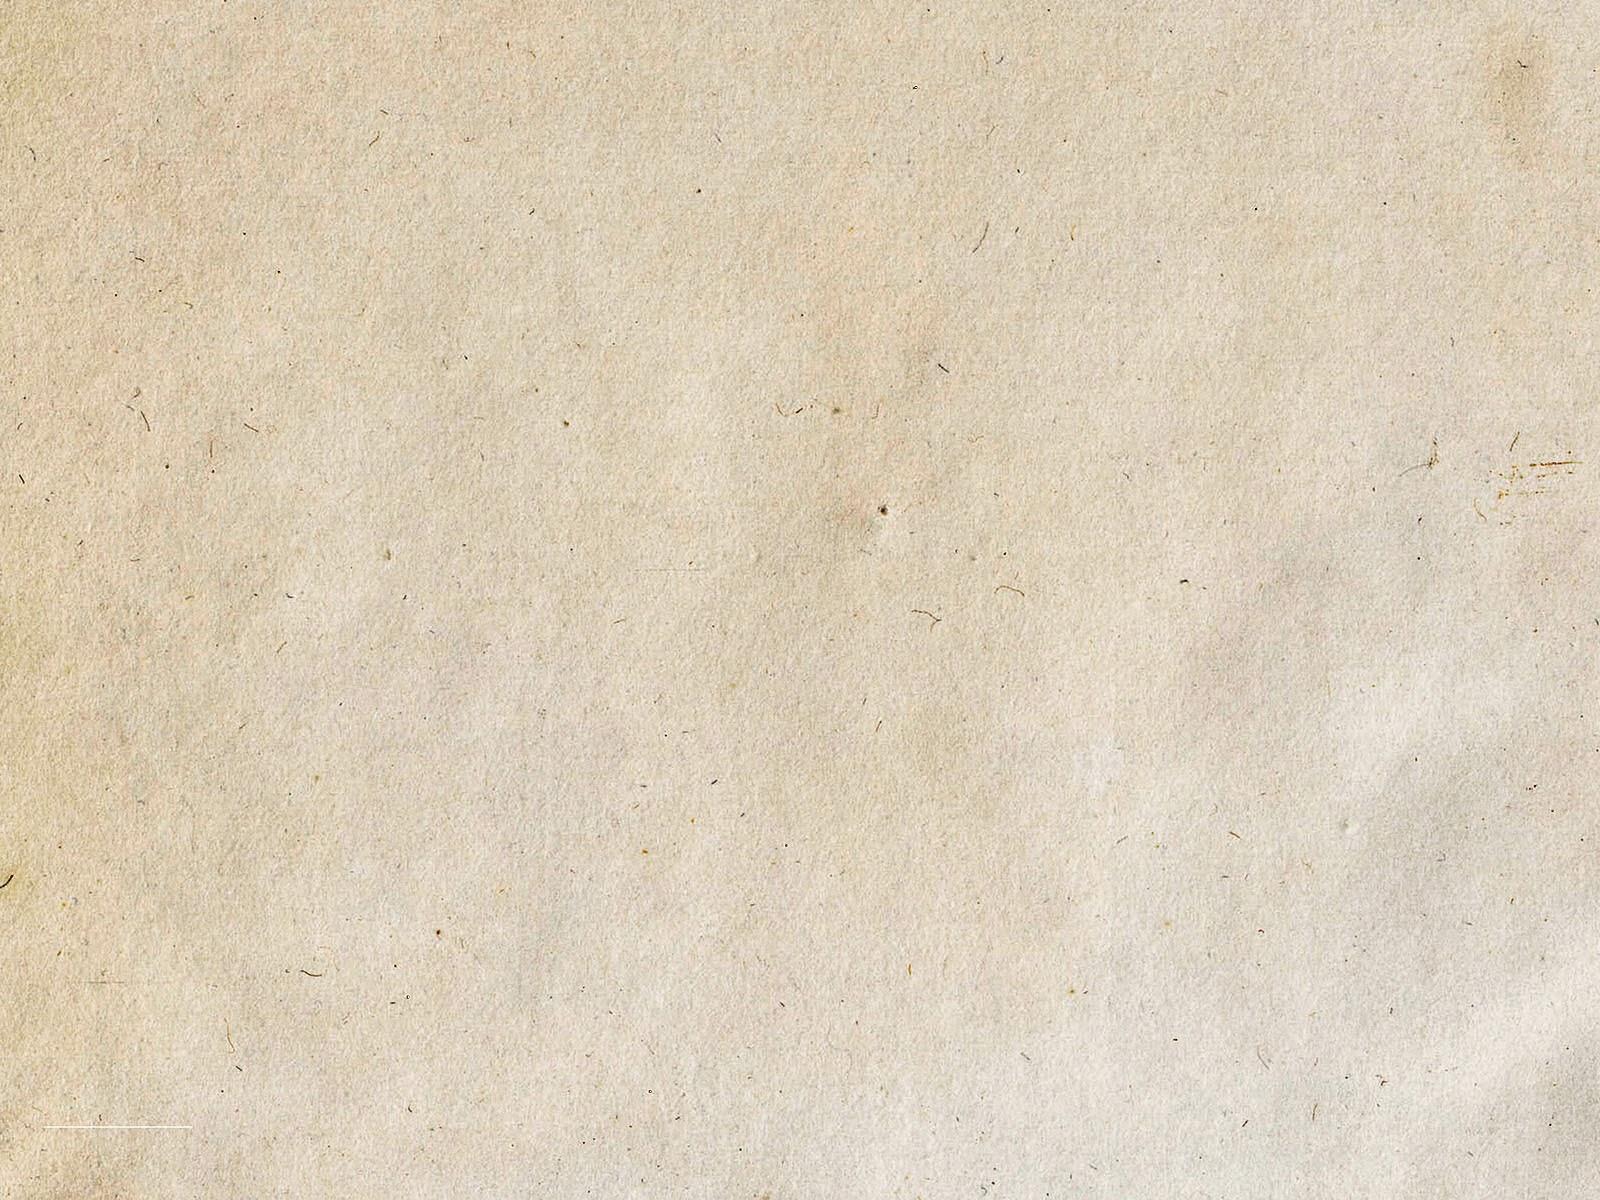 kraft paper as wallpaper - photo #22